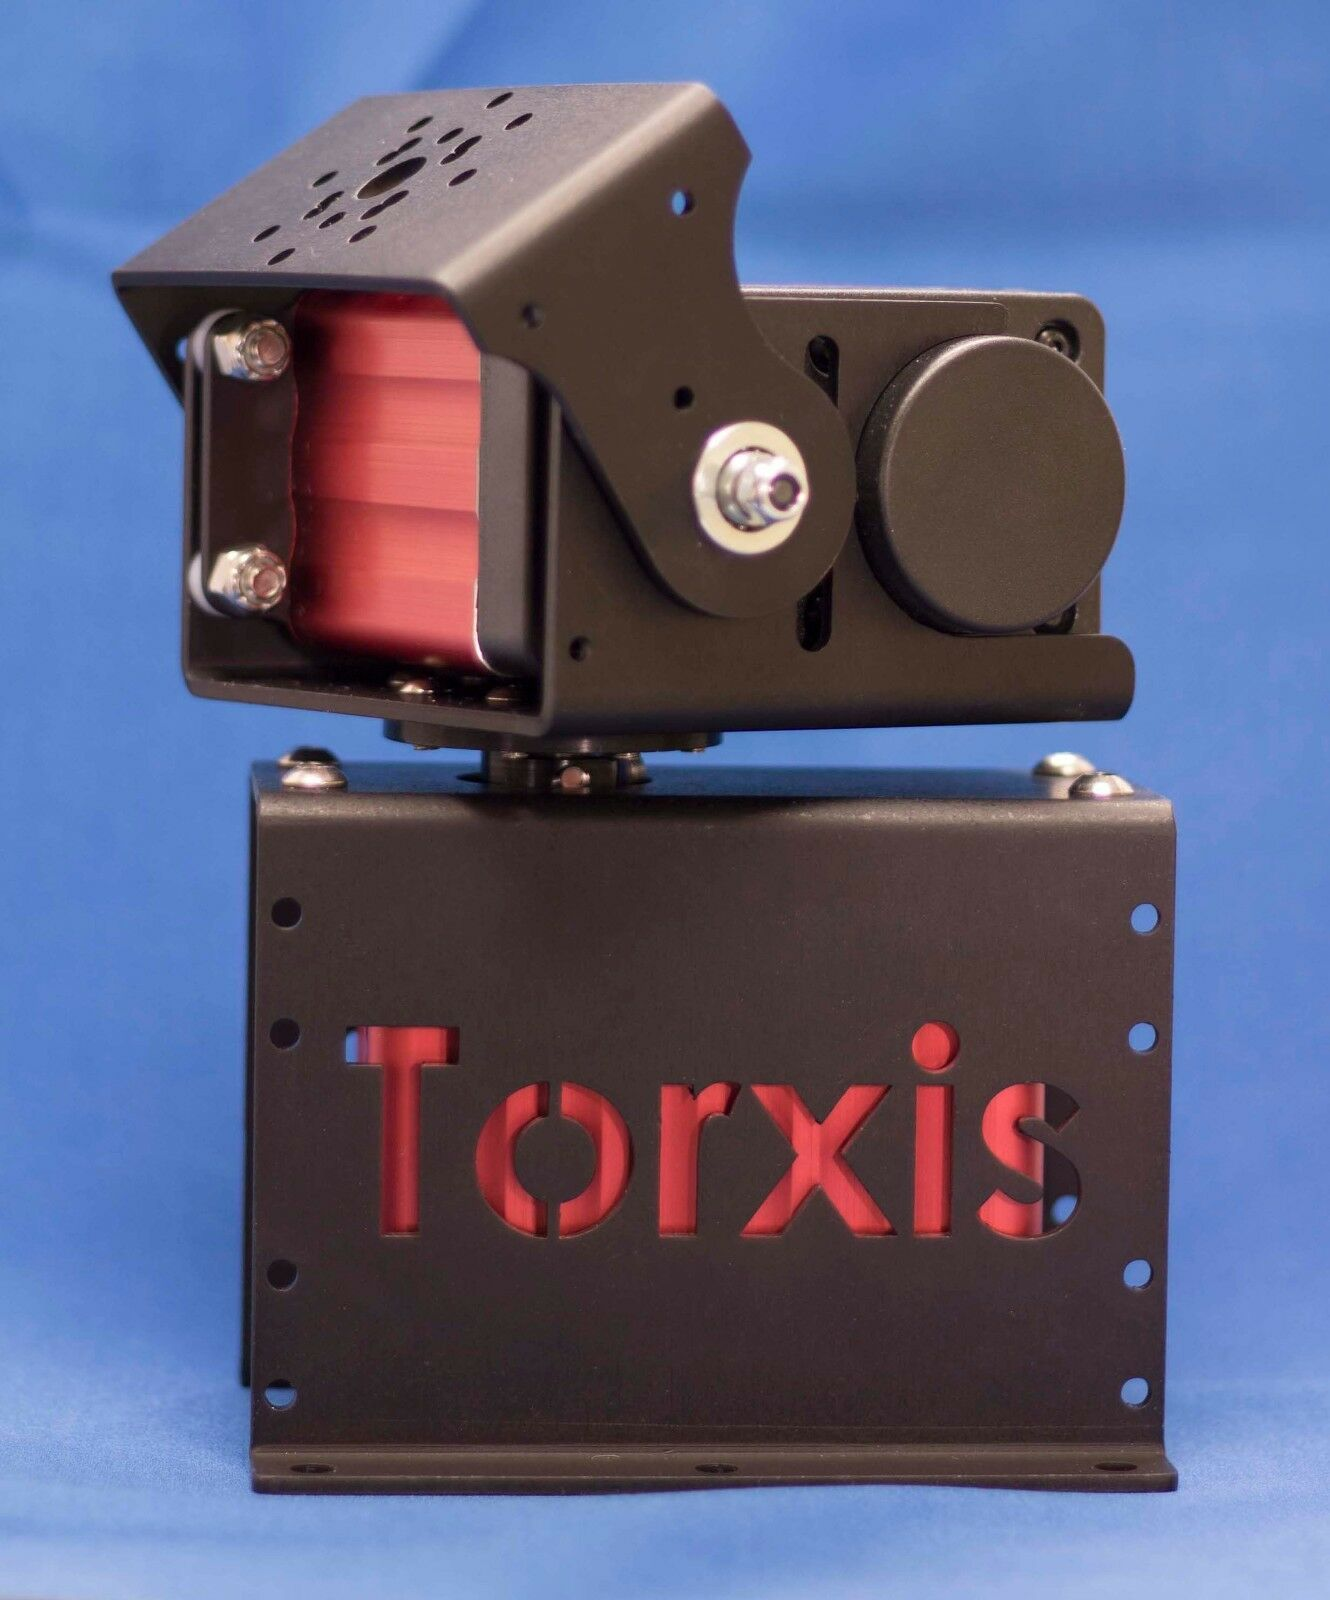 Pan   Tilt Unit Based on Torxis Servos